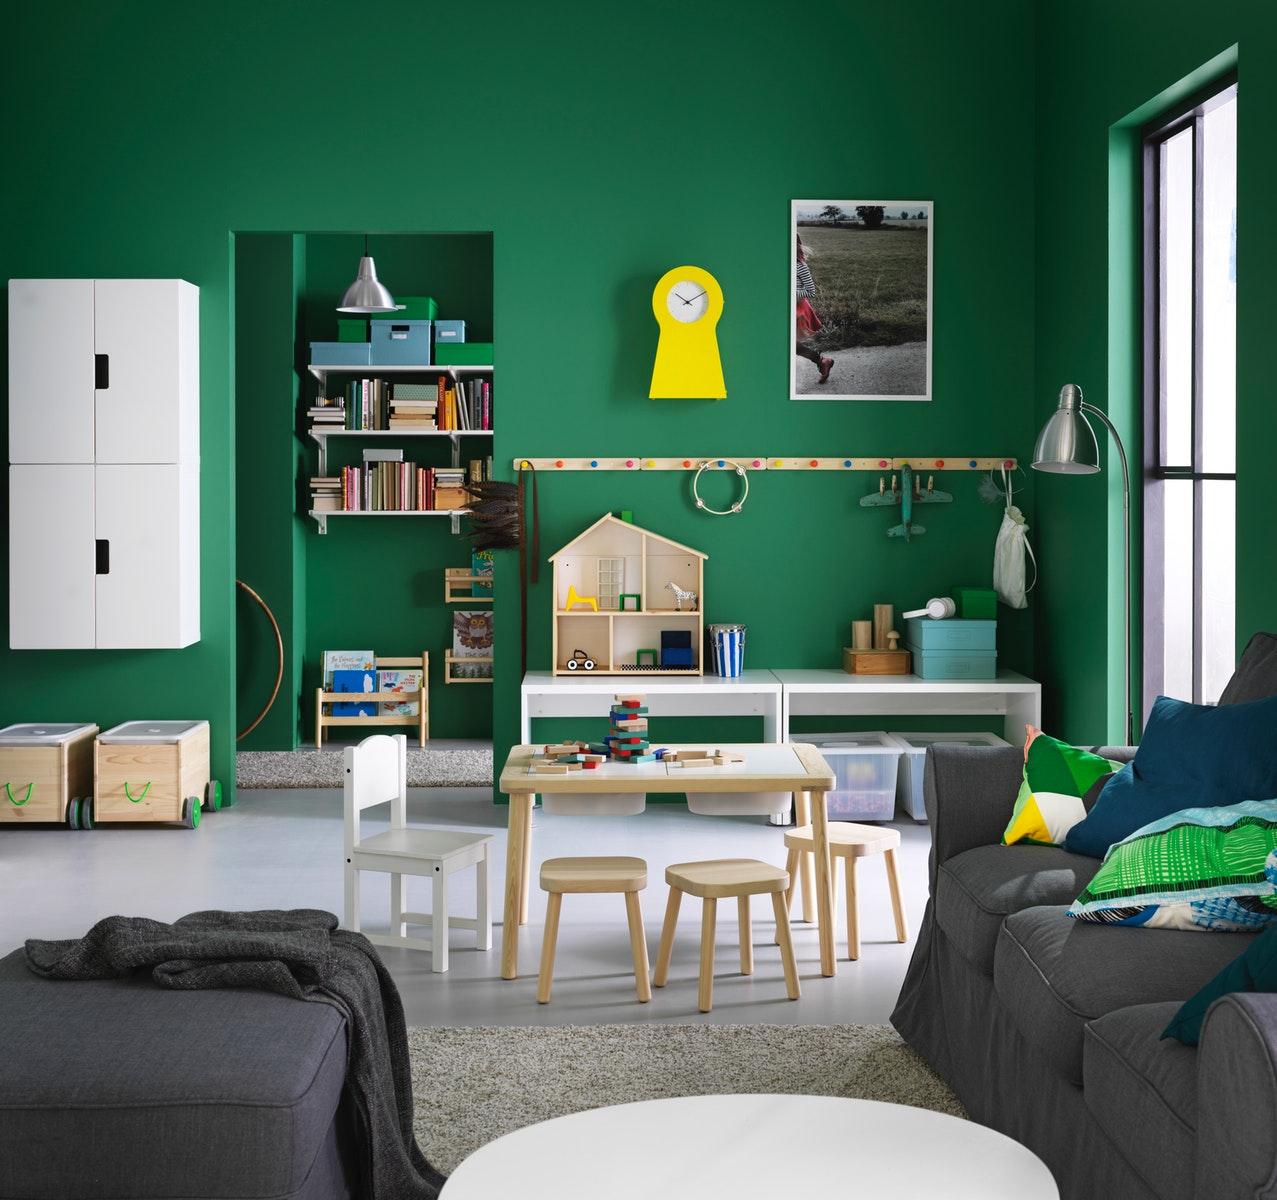 Ciptakan area bermain di ruang tamu